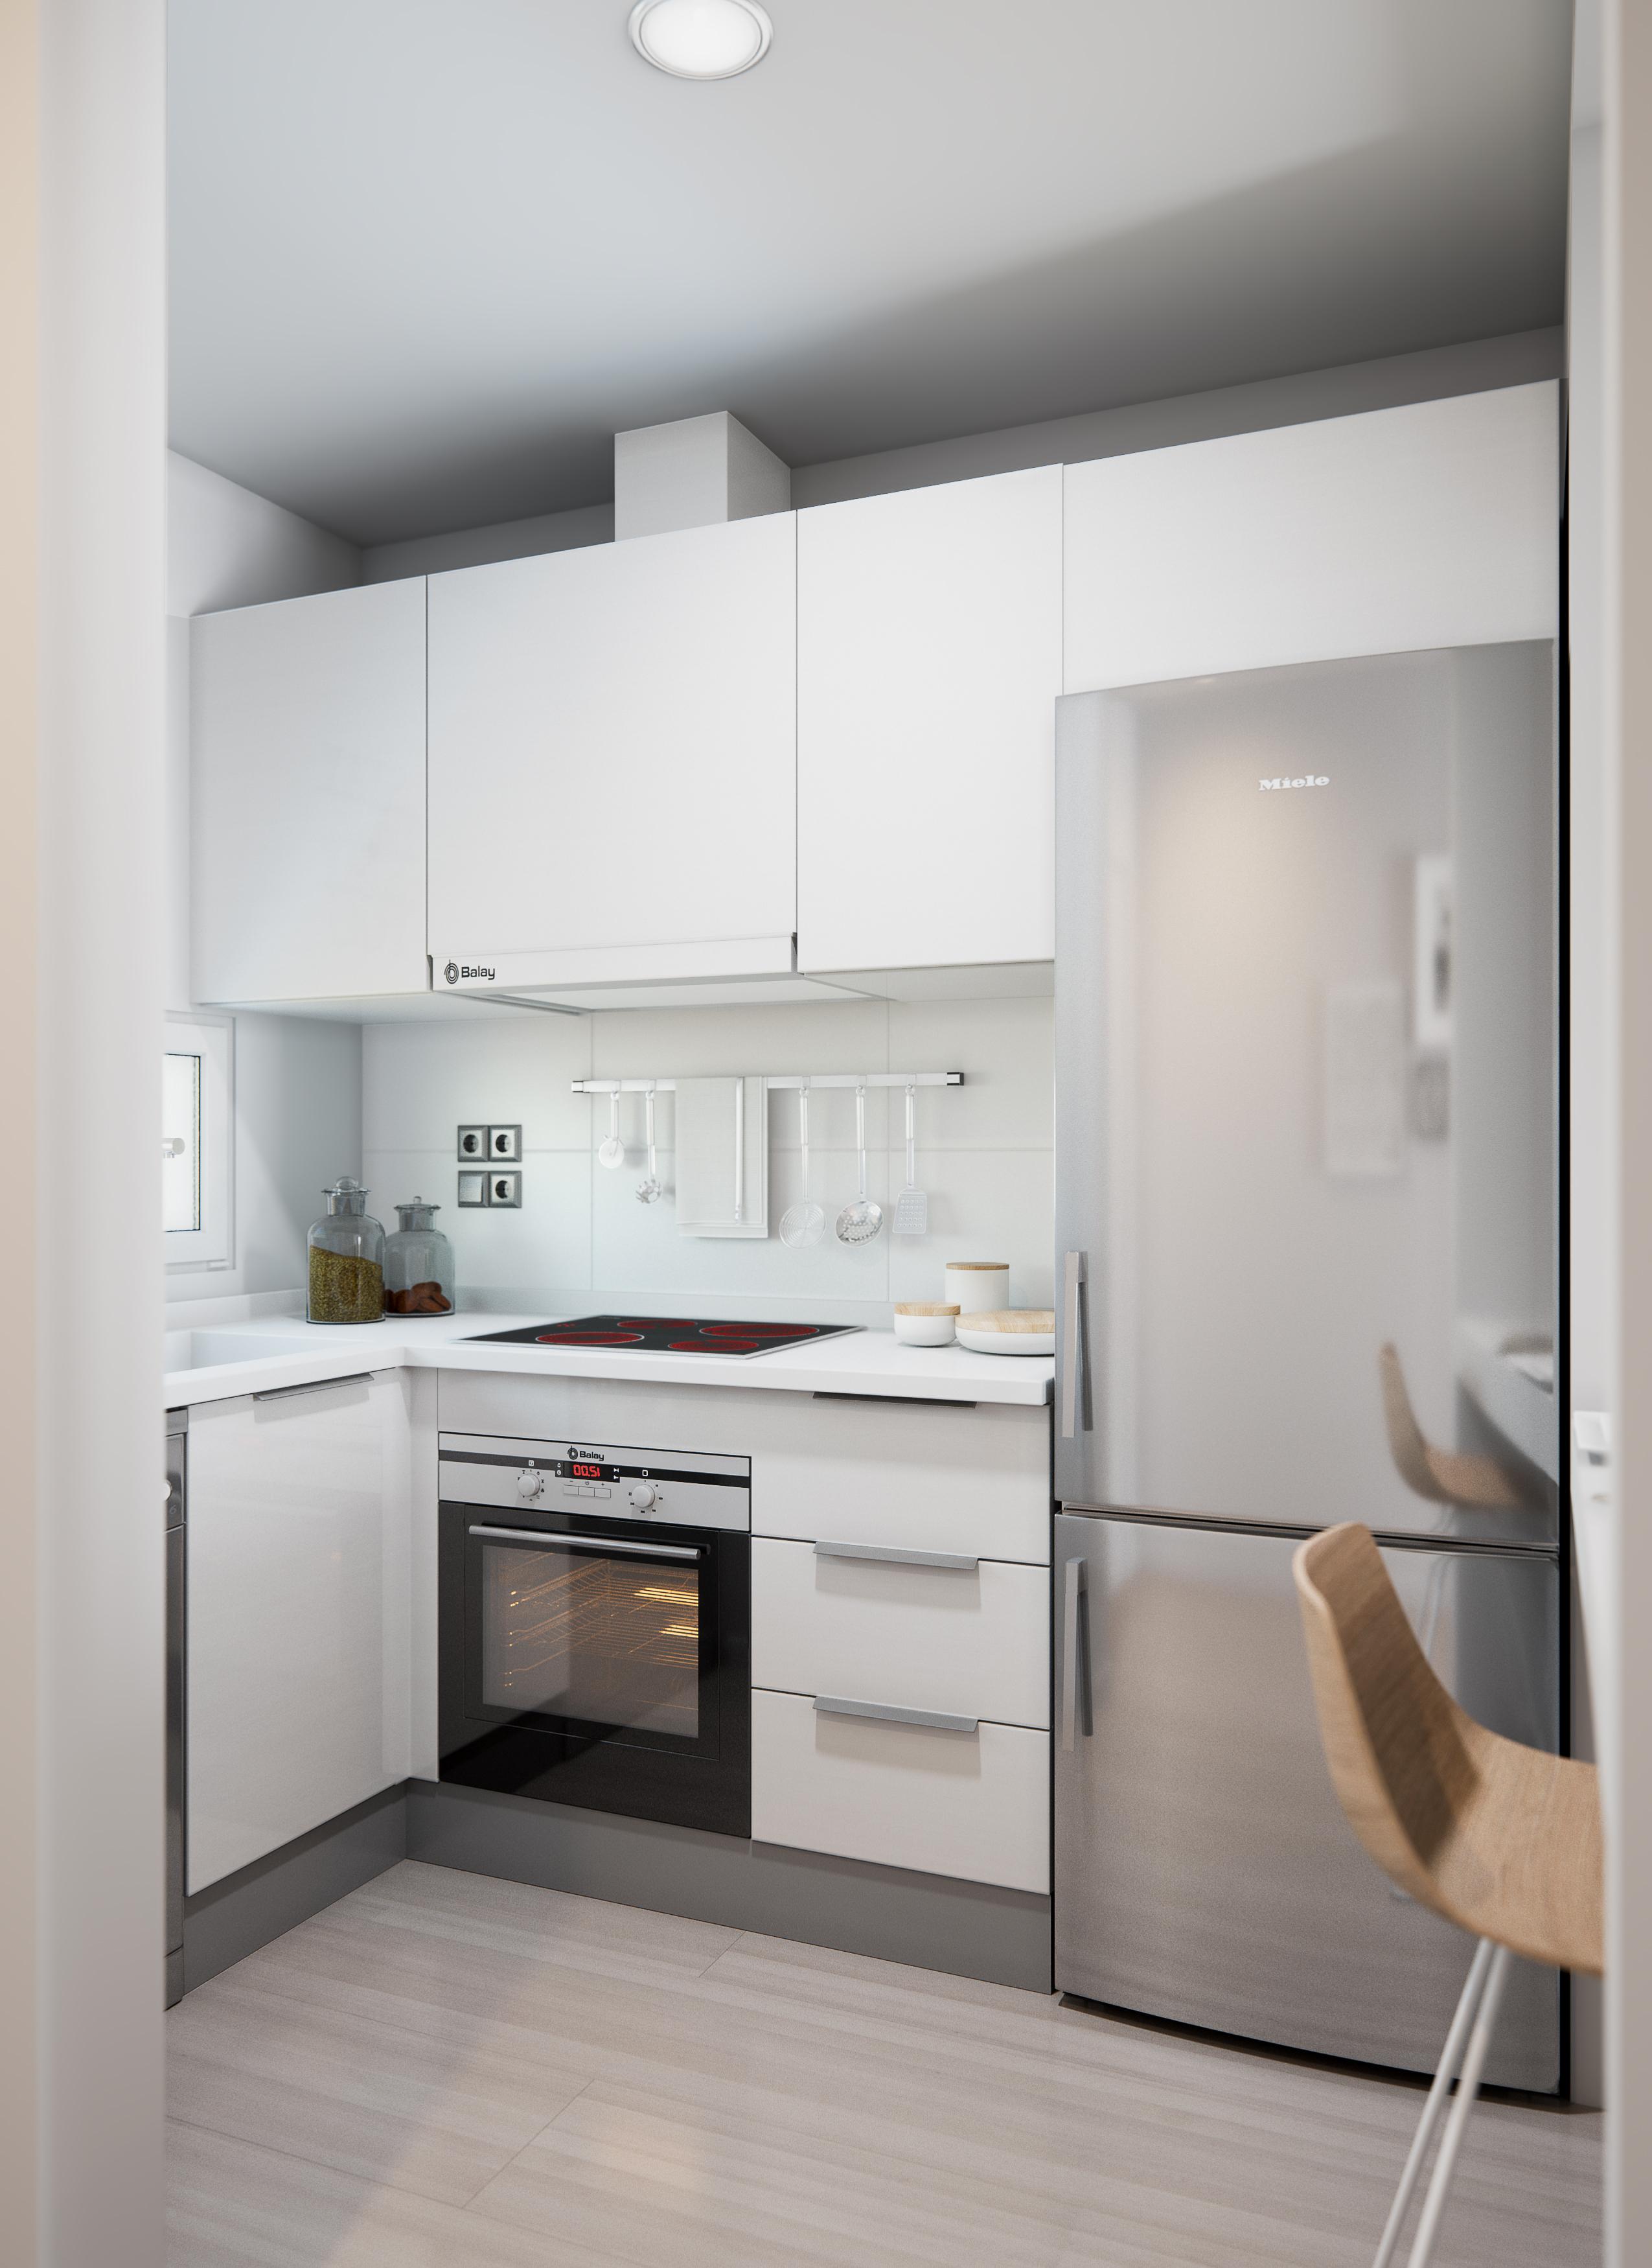 2 bedroom apartment For Sale in Roldan - photograph 3